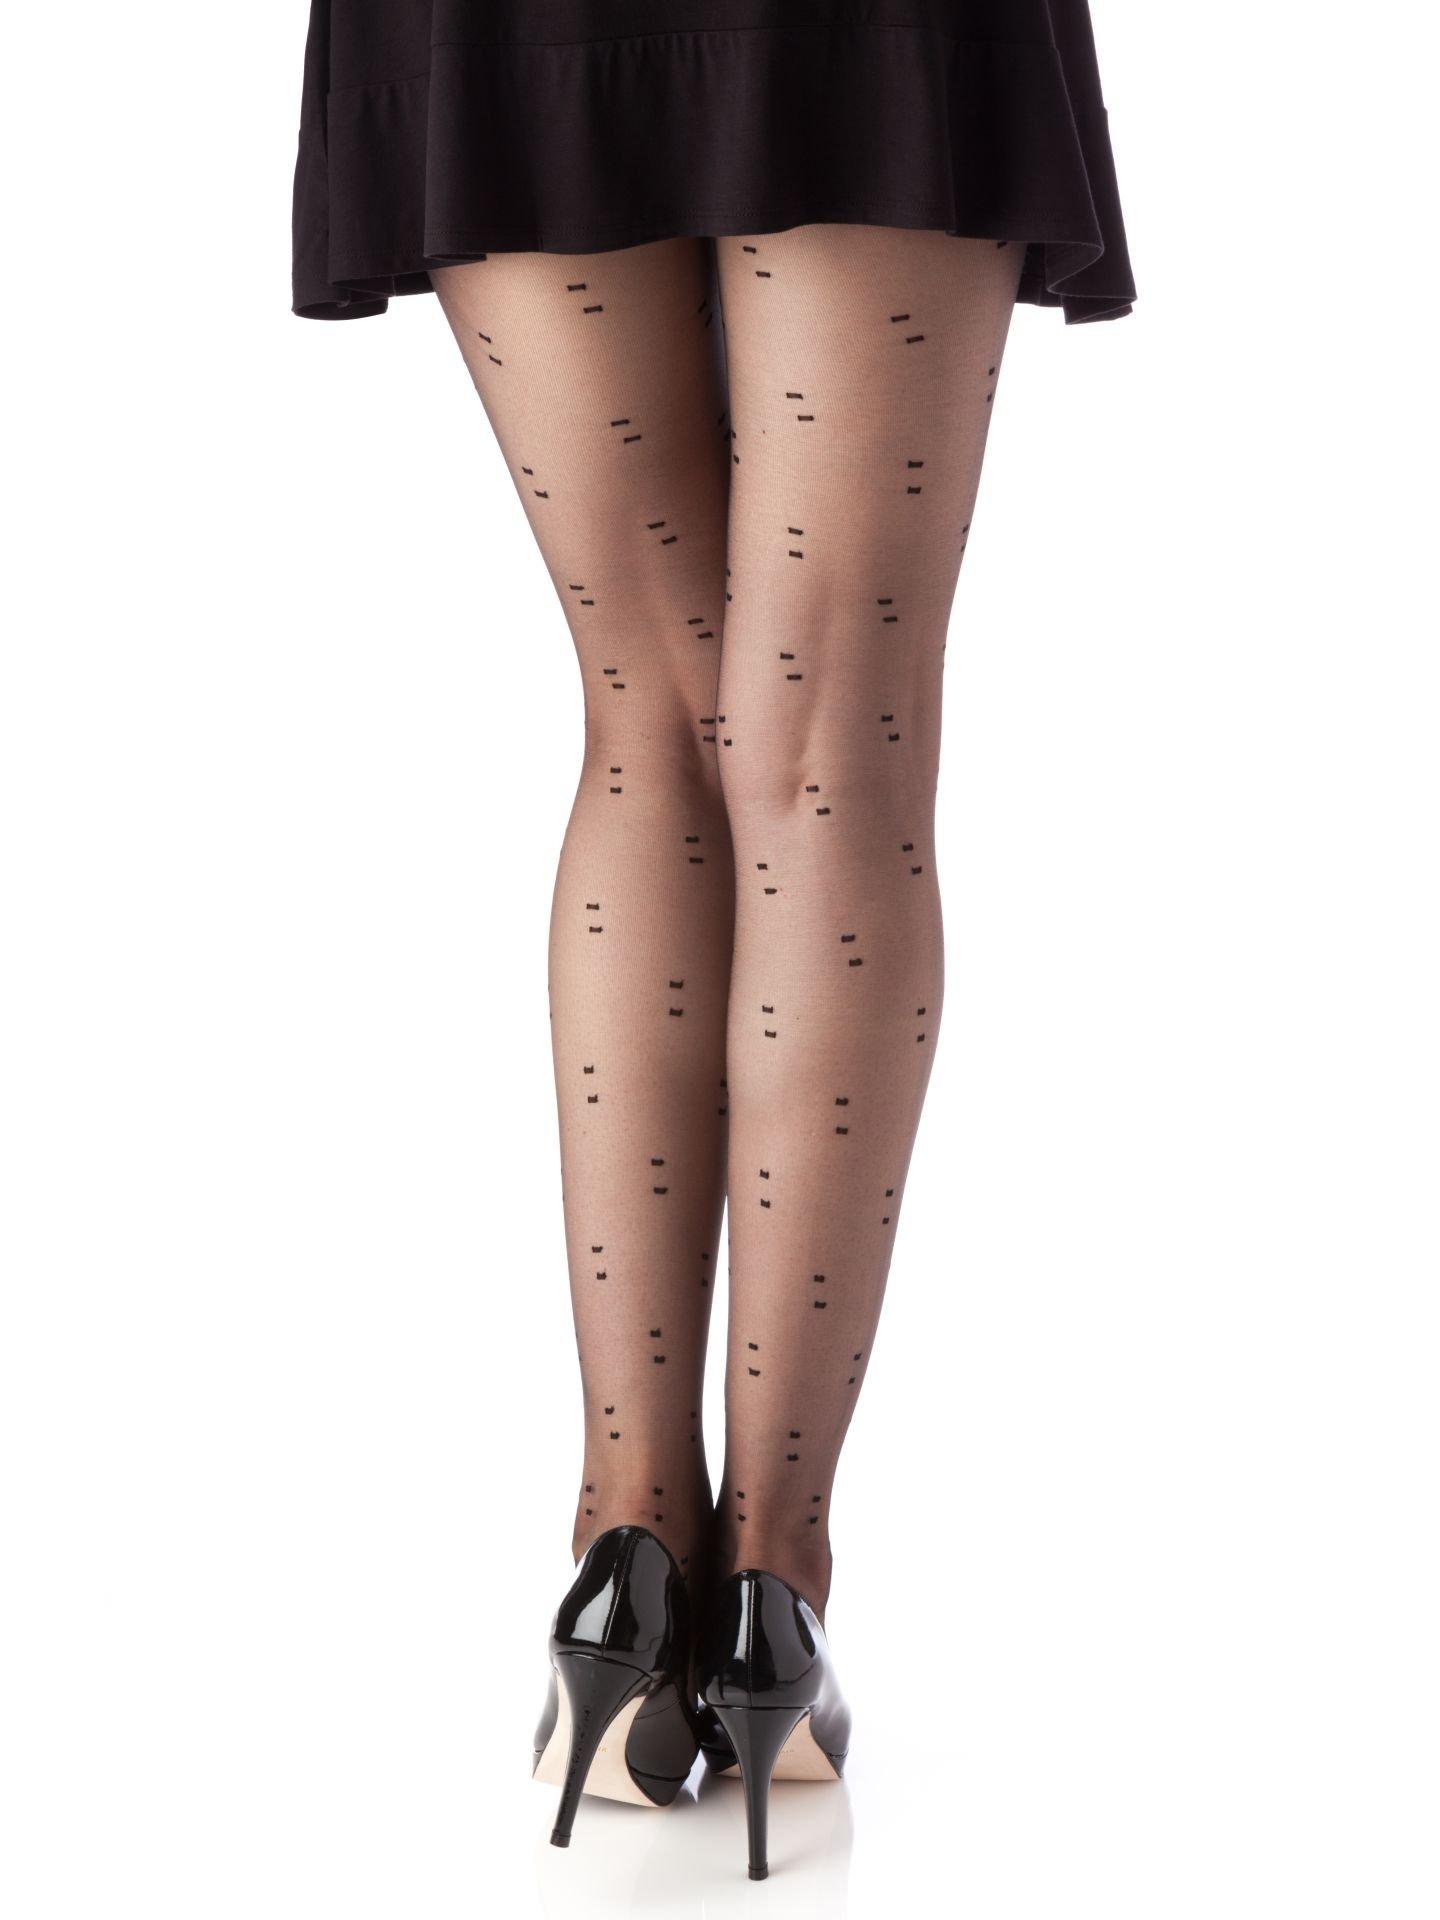 Berkshire Women's Trend City Dots Control Top Pantyhose-8865, Black, Petite